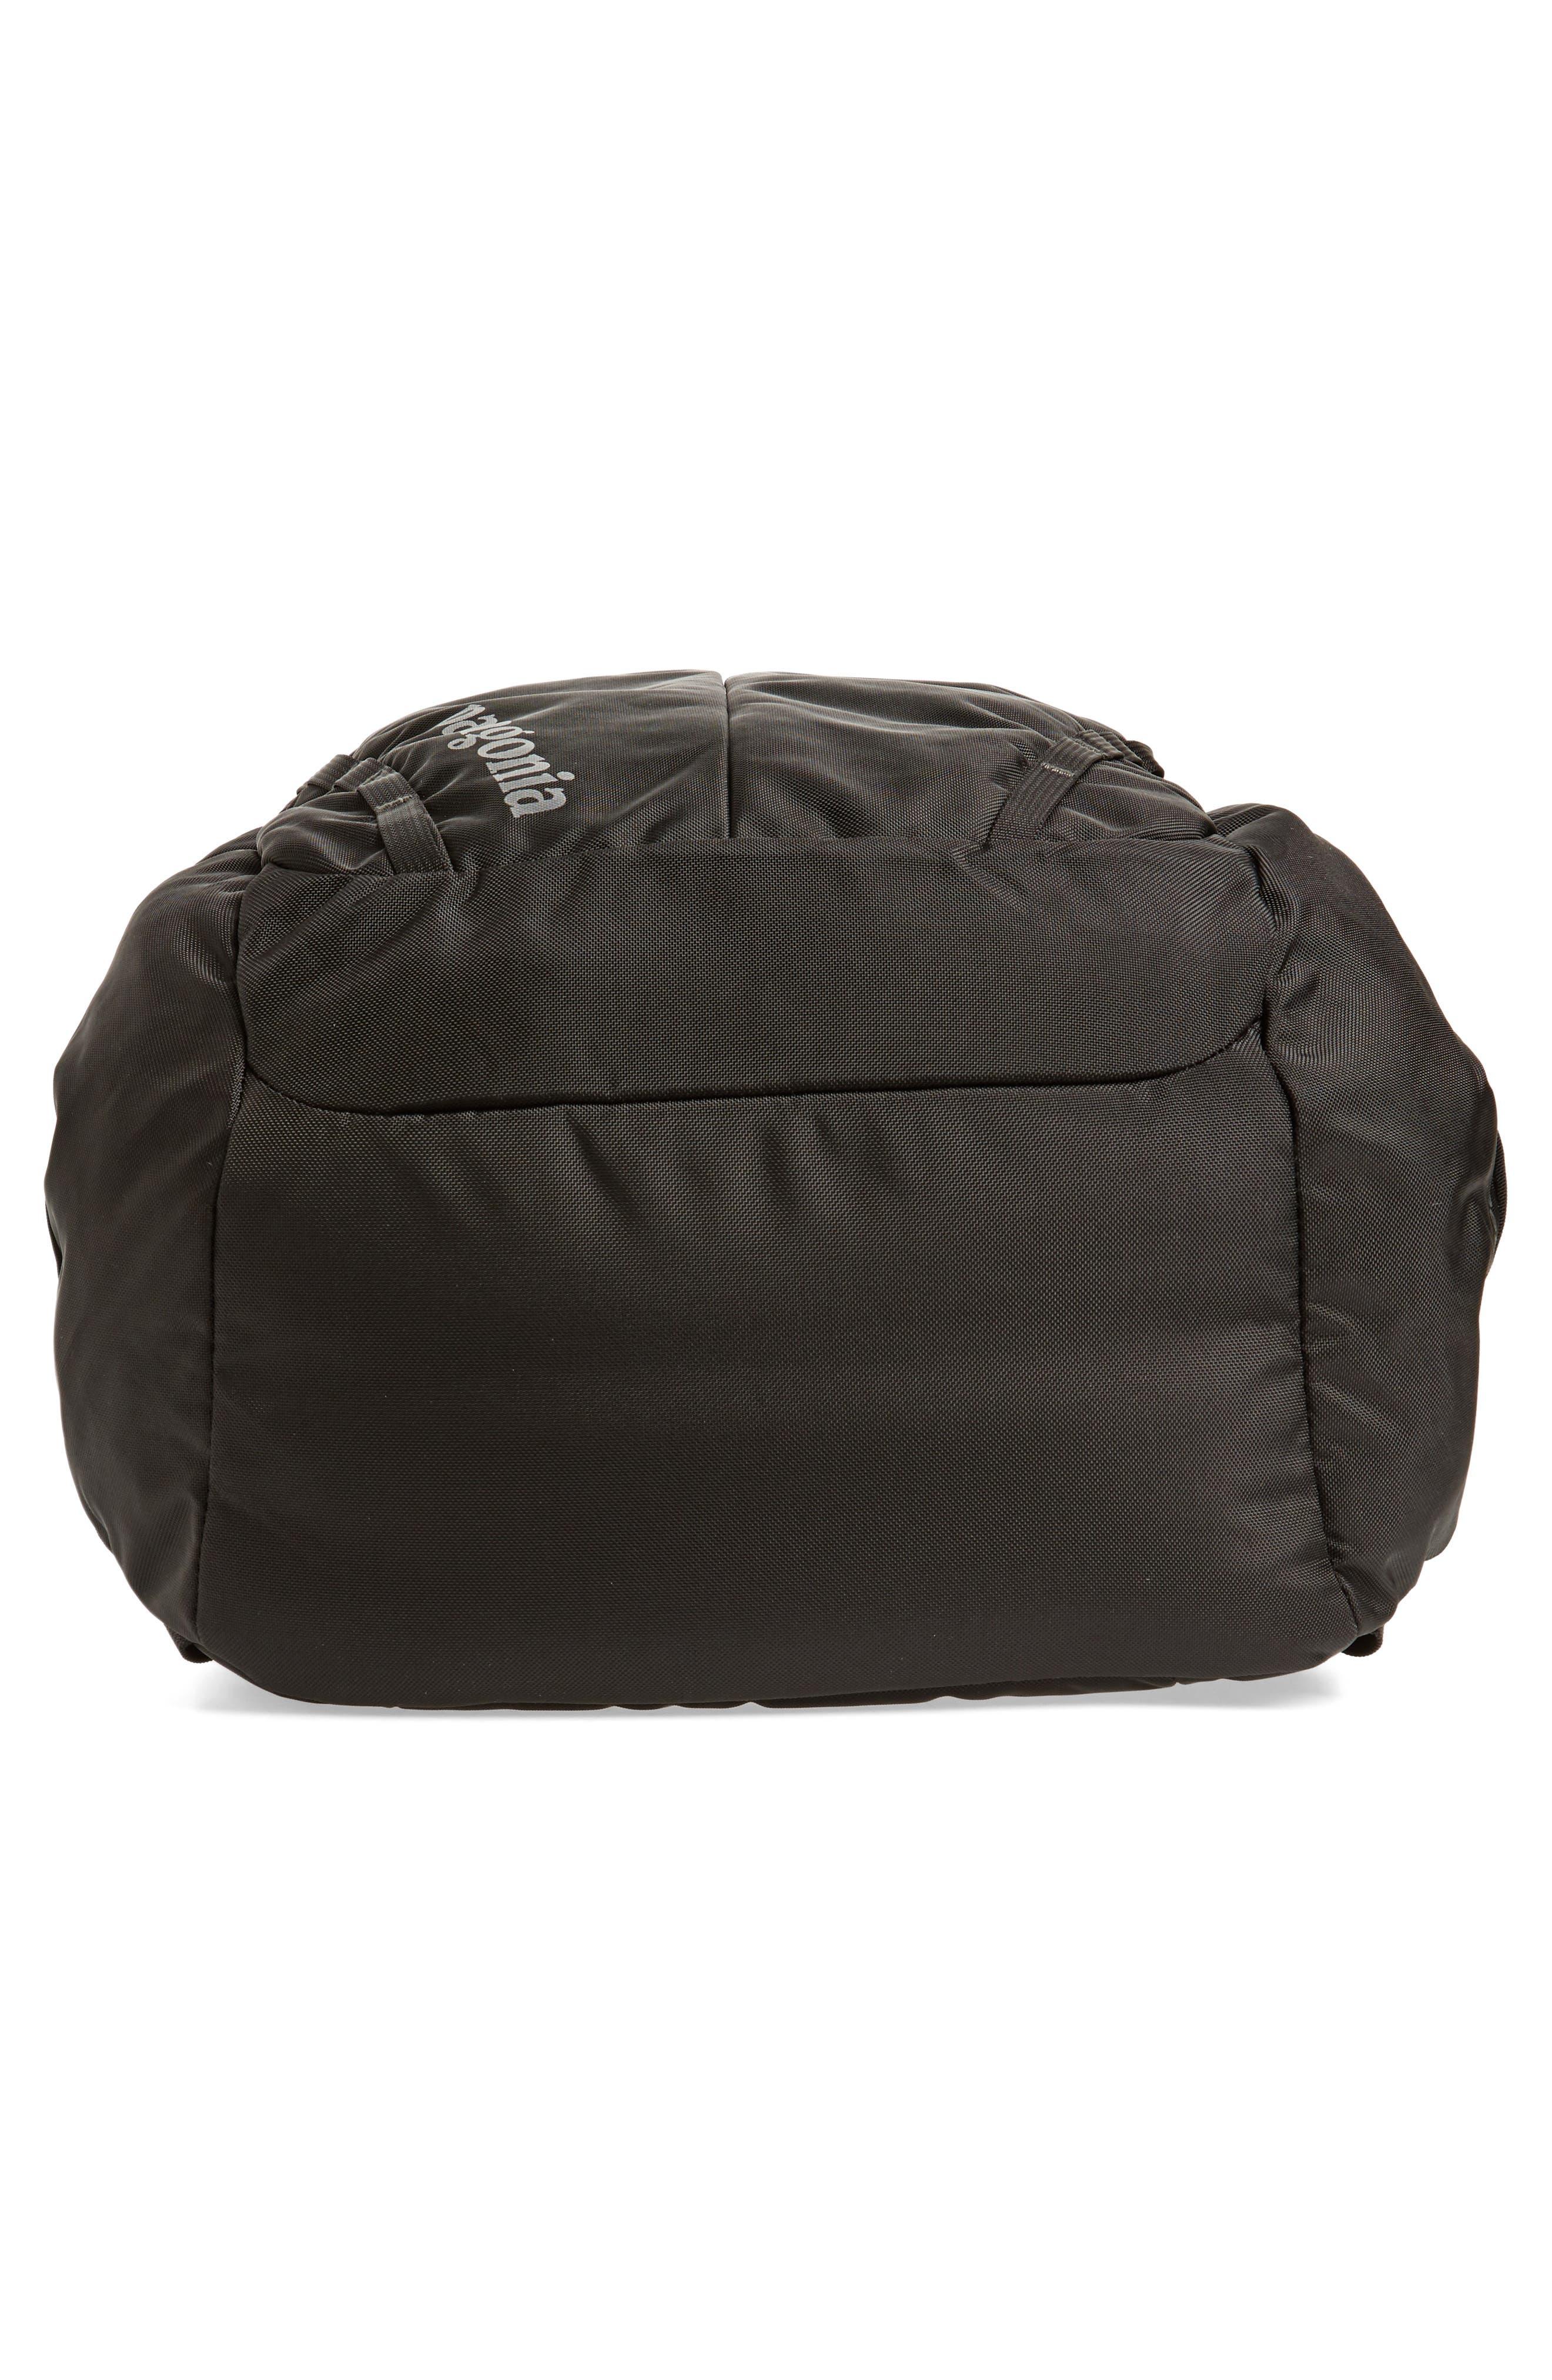 28L Refugio Backpack,                             Alternate thumbnail 6, color,                             BLACK